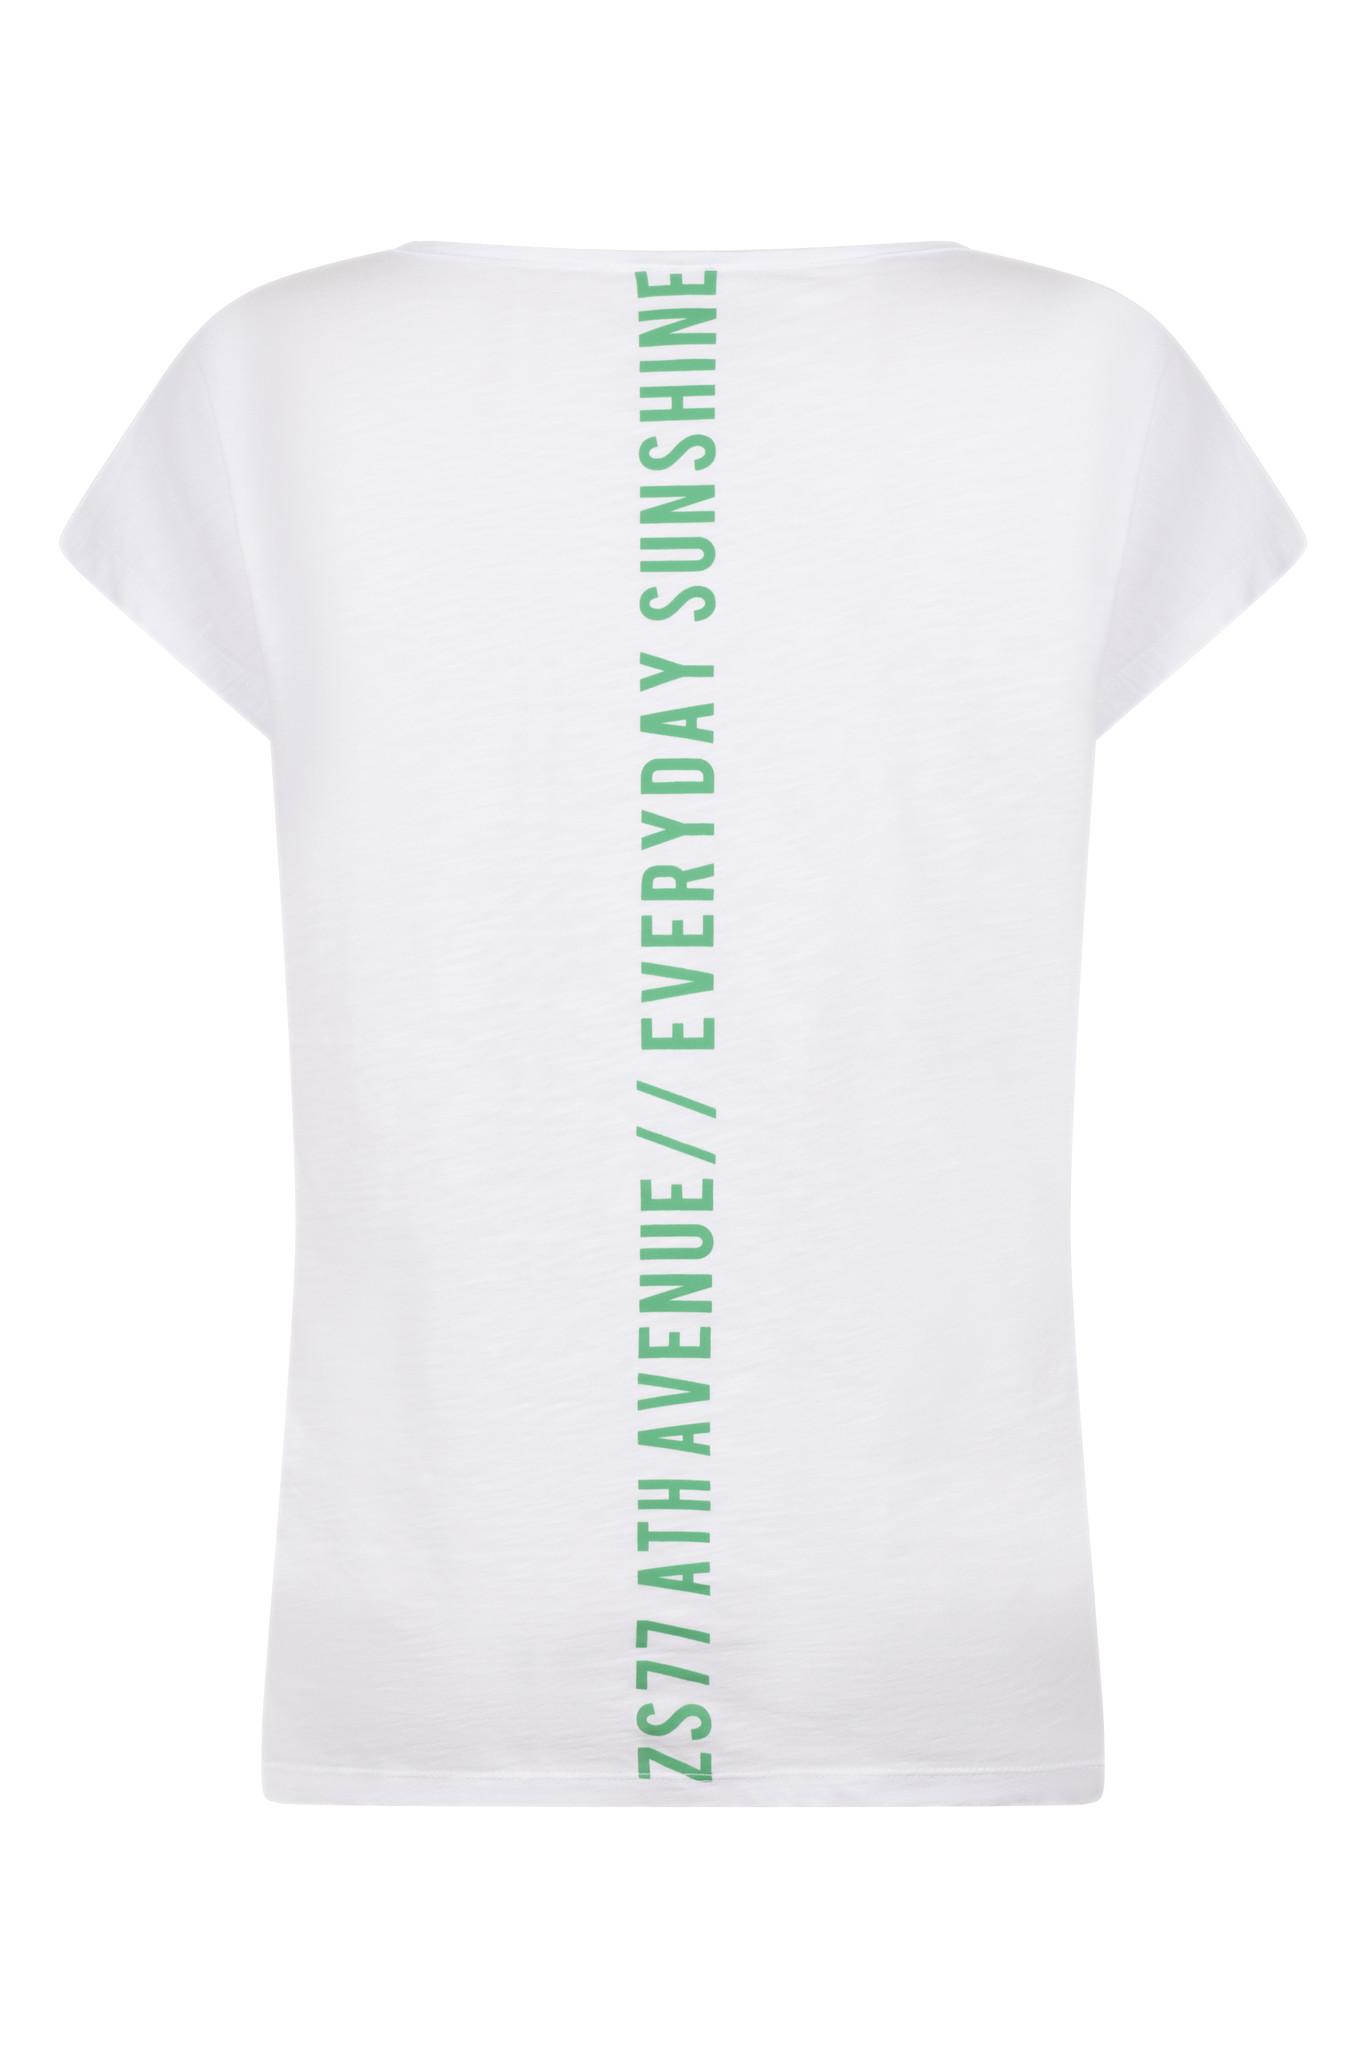 Zoso Zoso Ever t-shirt with print white/green